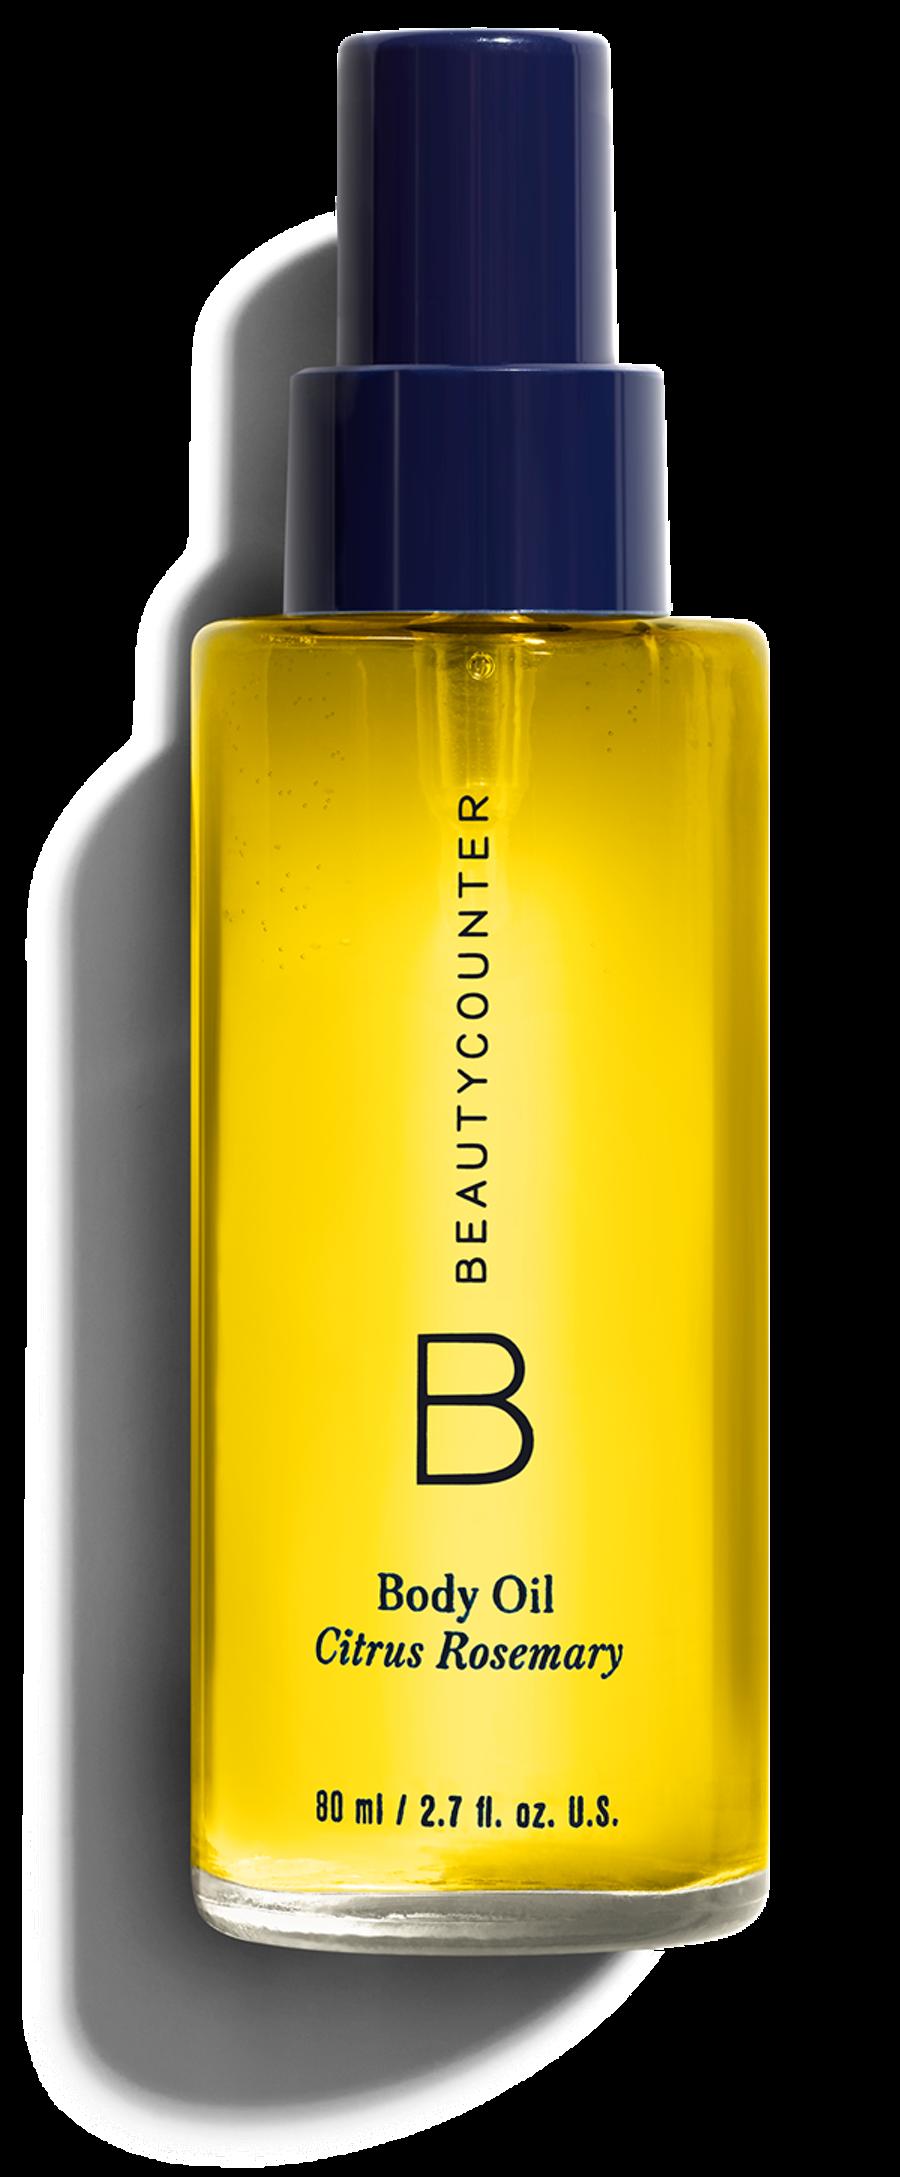 beautycounter-body oil-citrus rosemary.png